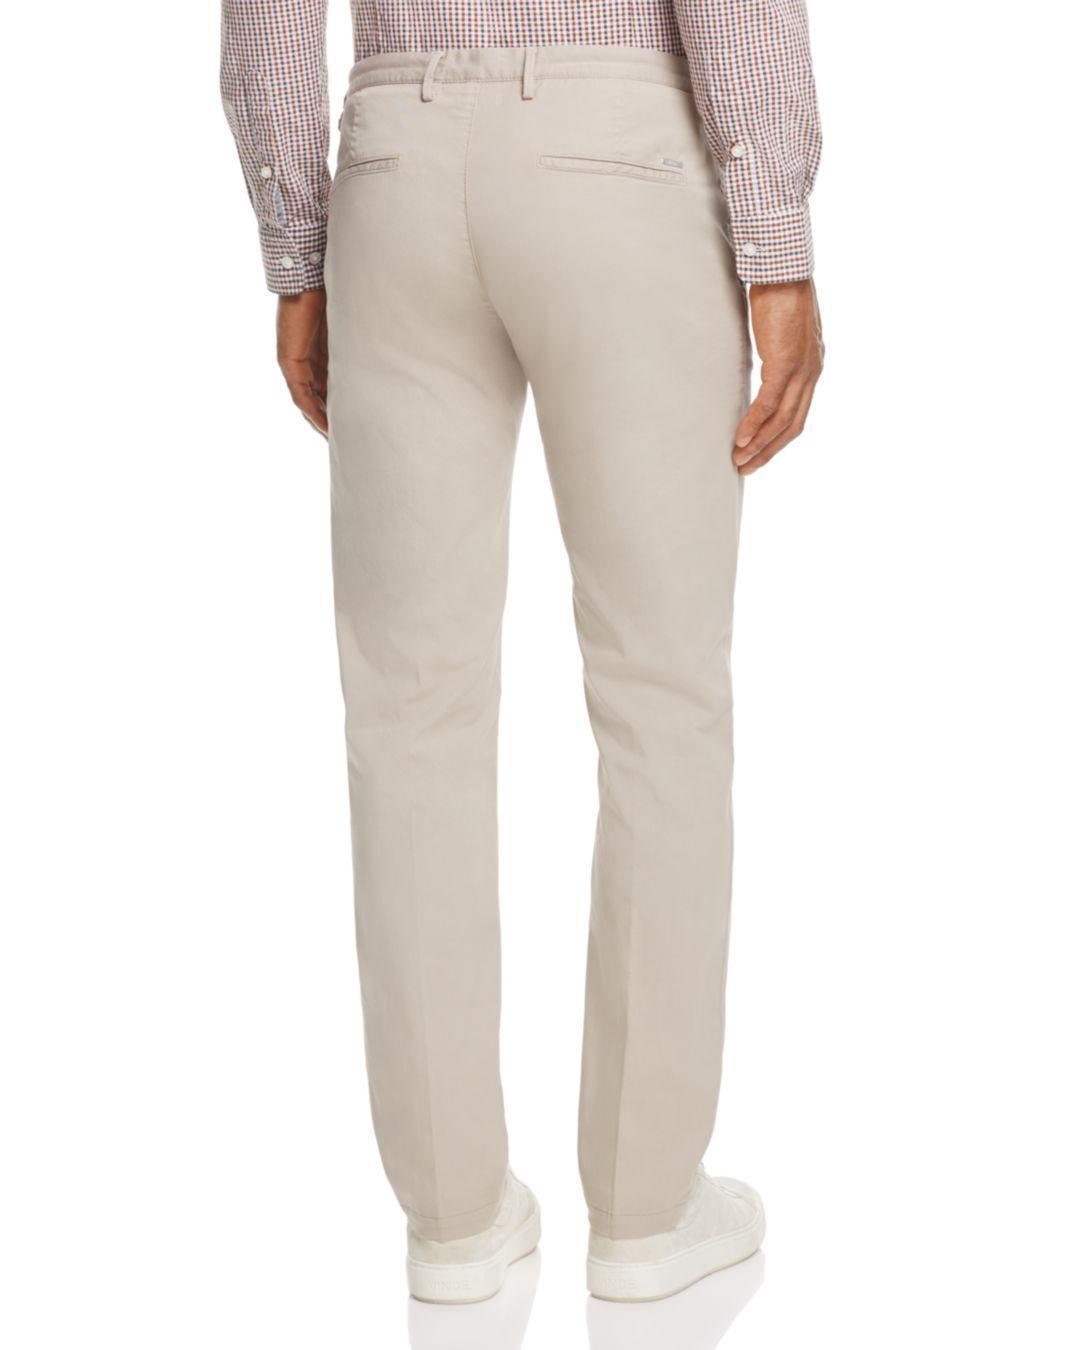 536943aa3 BOSS Hugo Boss Rice Slim Fit Chino Pants in Natural for Men - Lyst